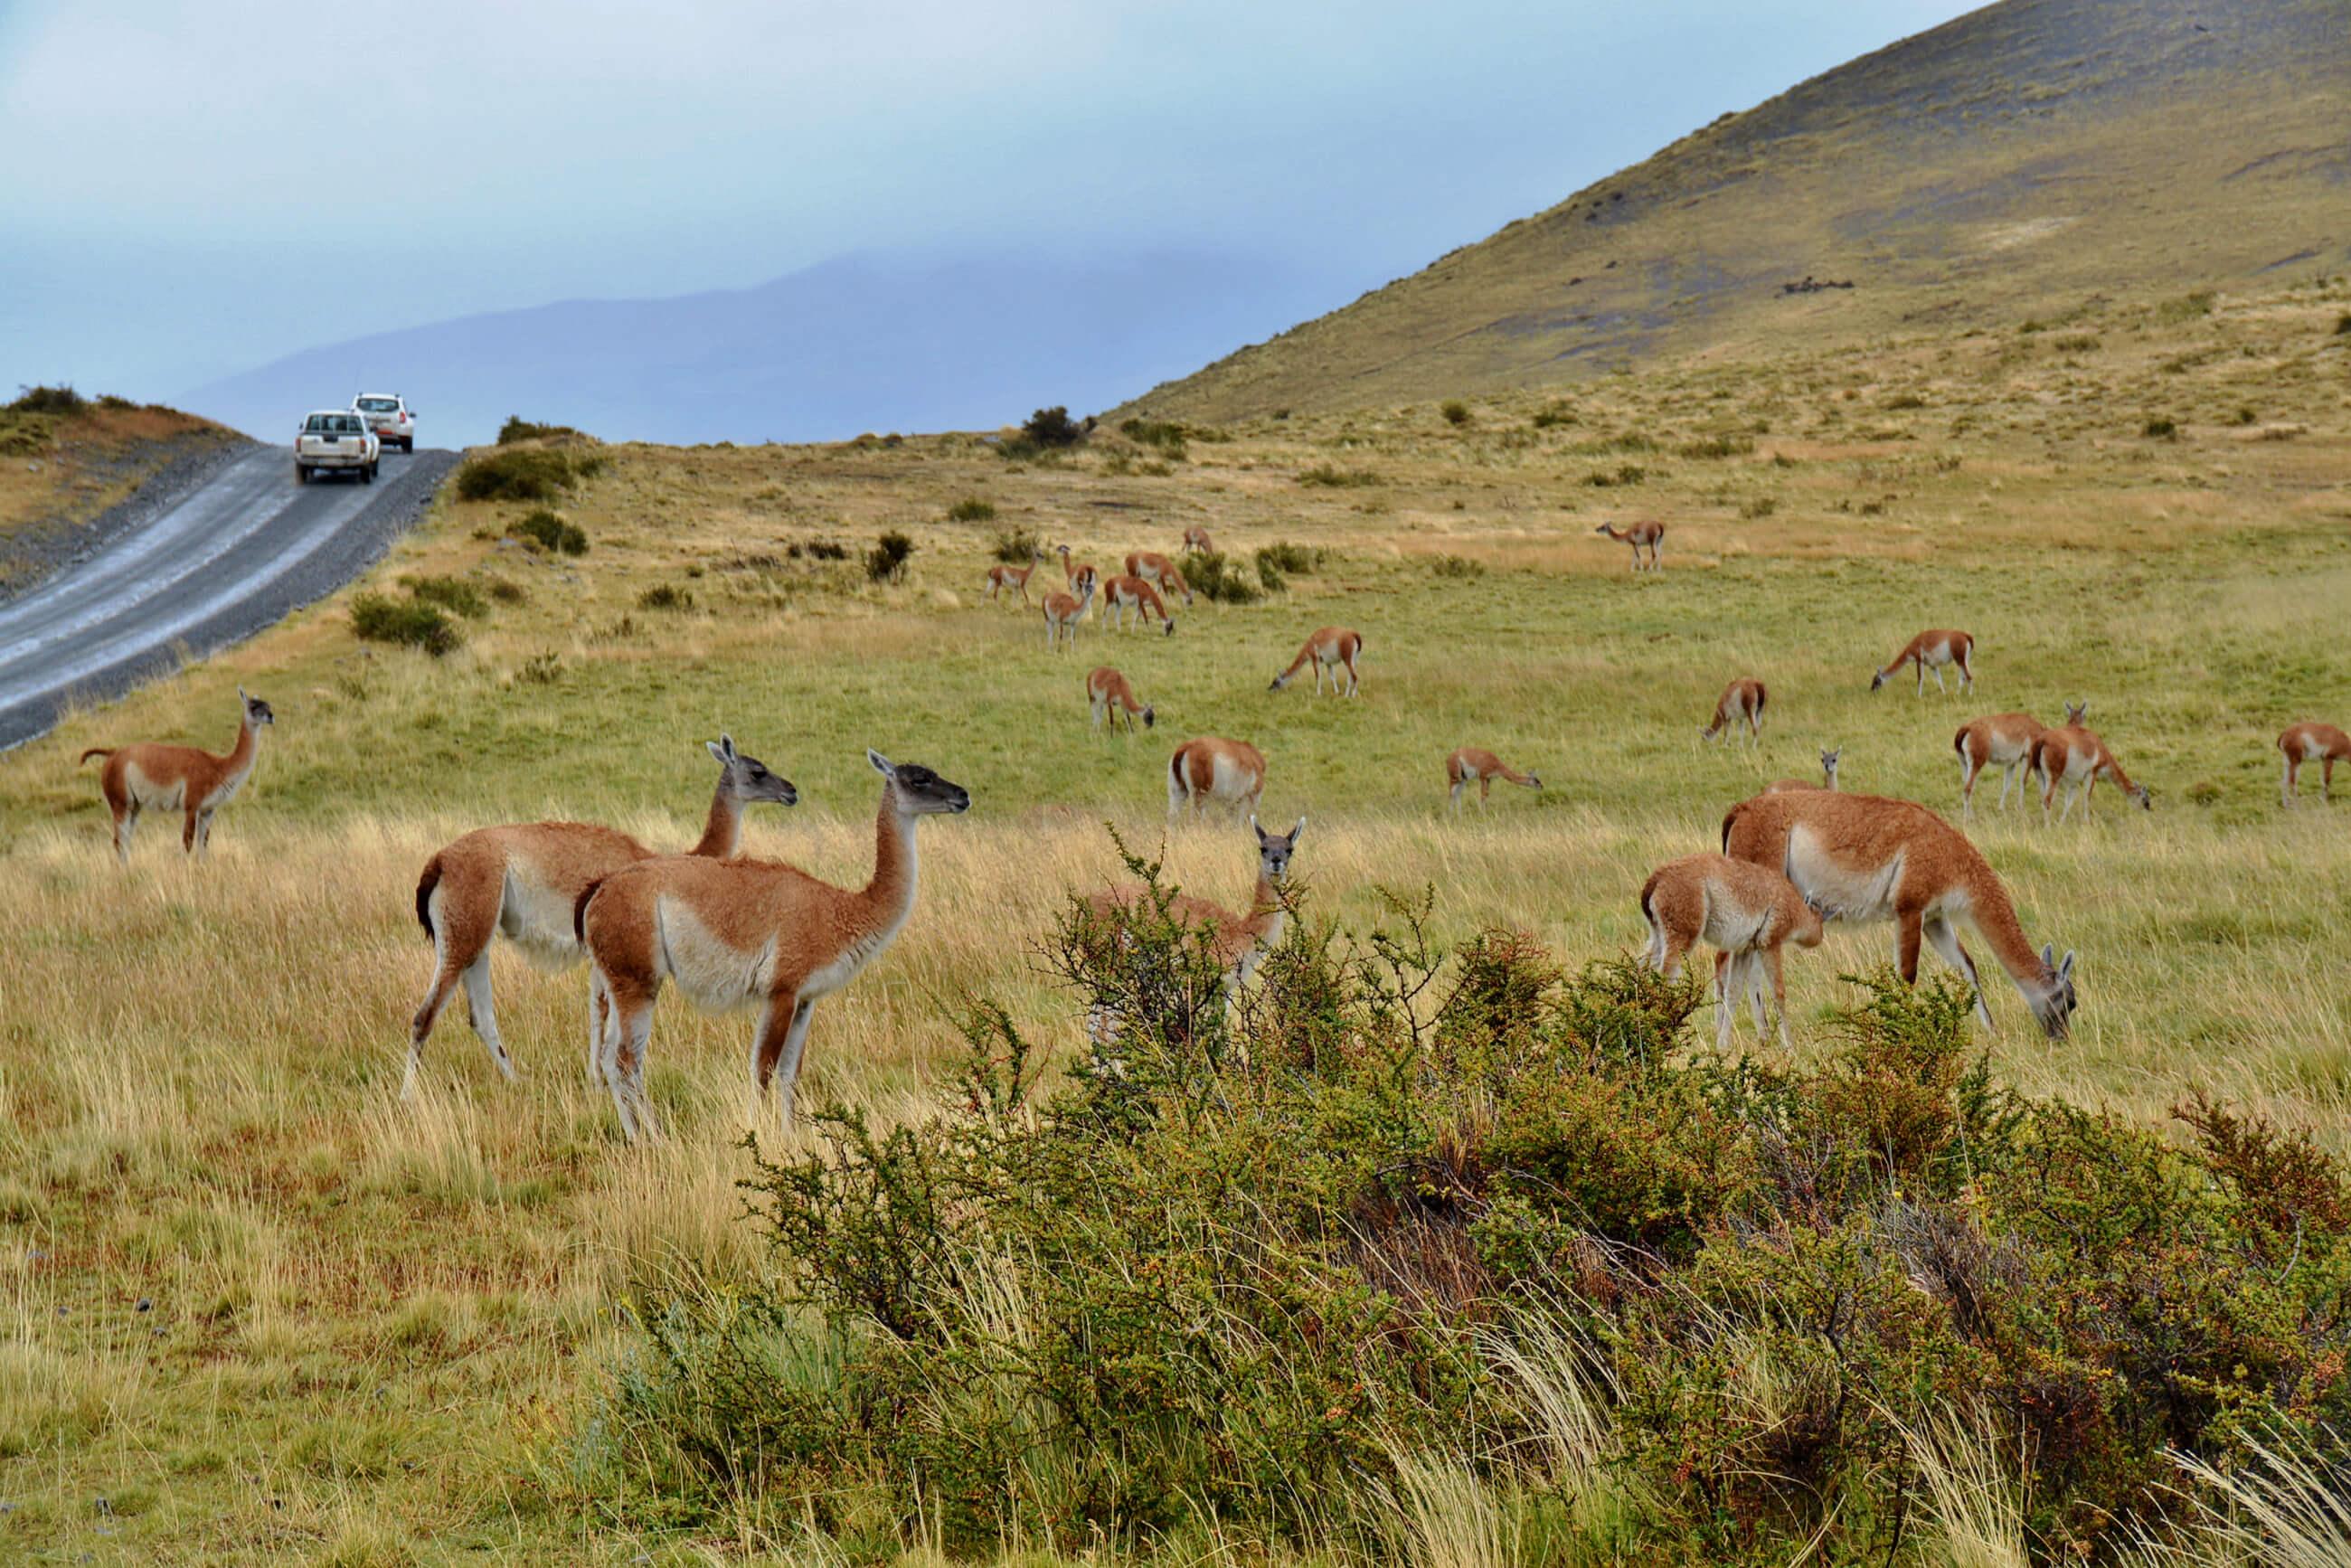 https://bubo.sk/uploads/galleries/5017/patagonia-chile-mirka-sulka-71-.jpg